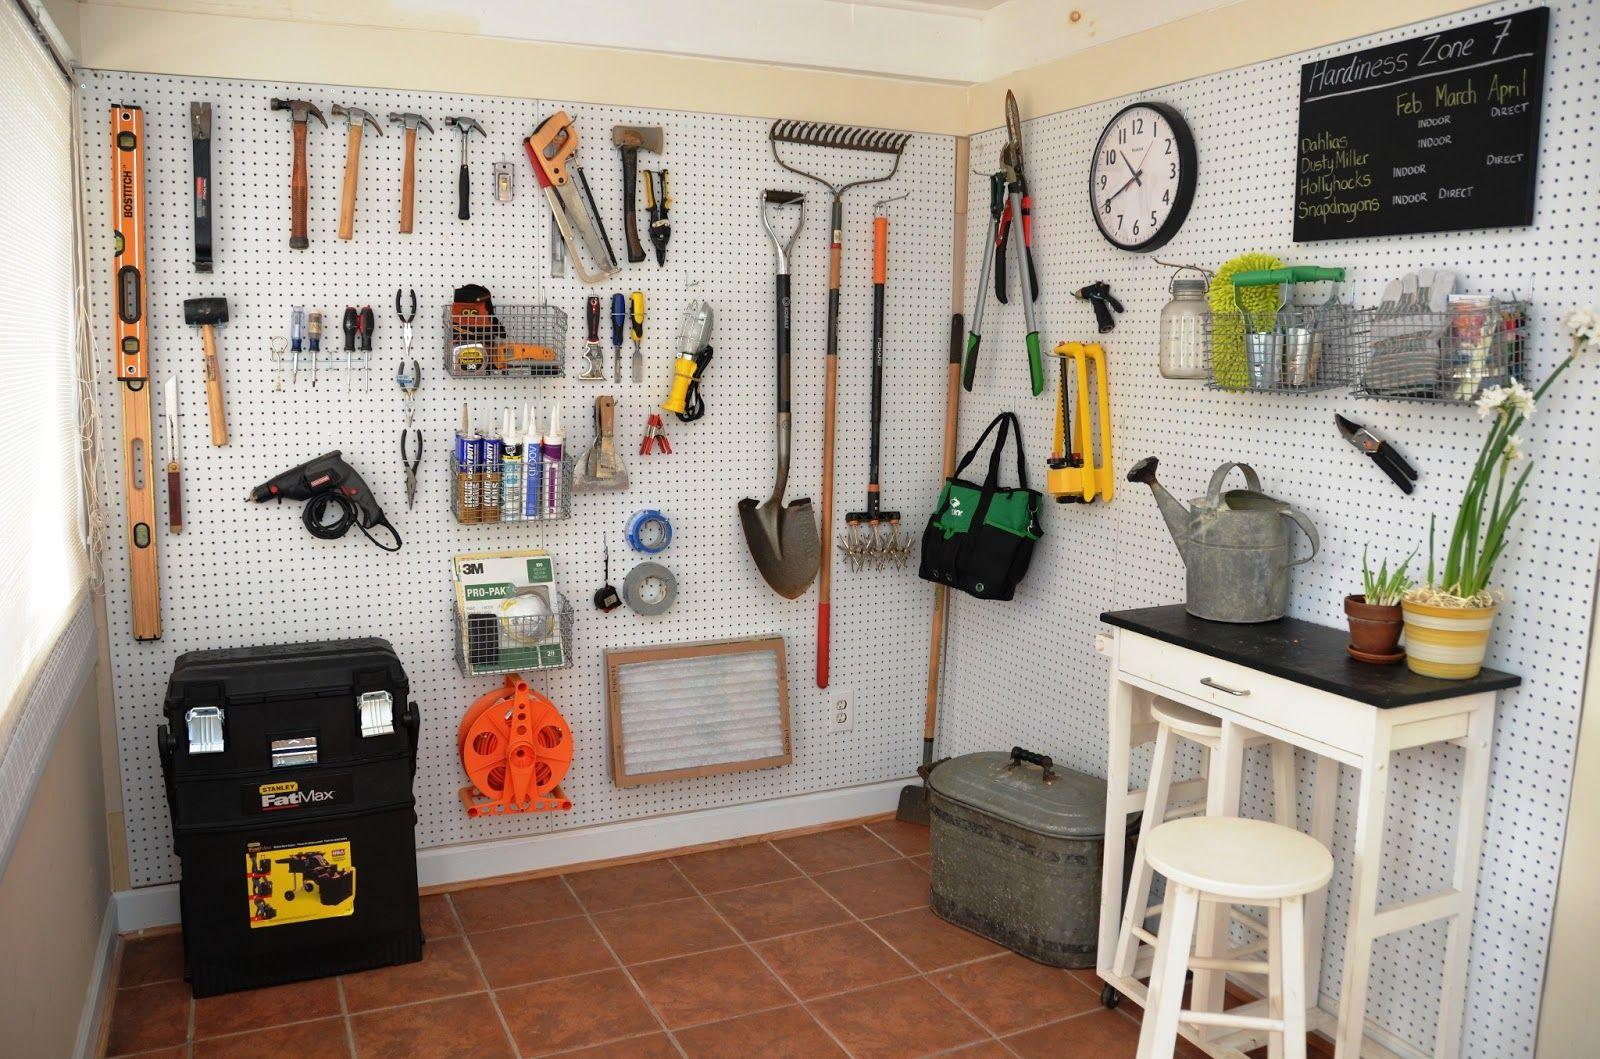 8 Ways to Organize With a Peg Board - Organization Junkie | Garage ...